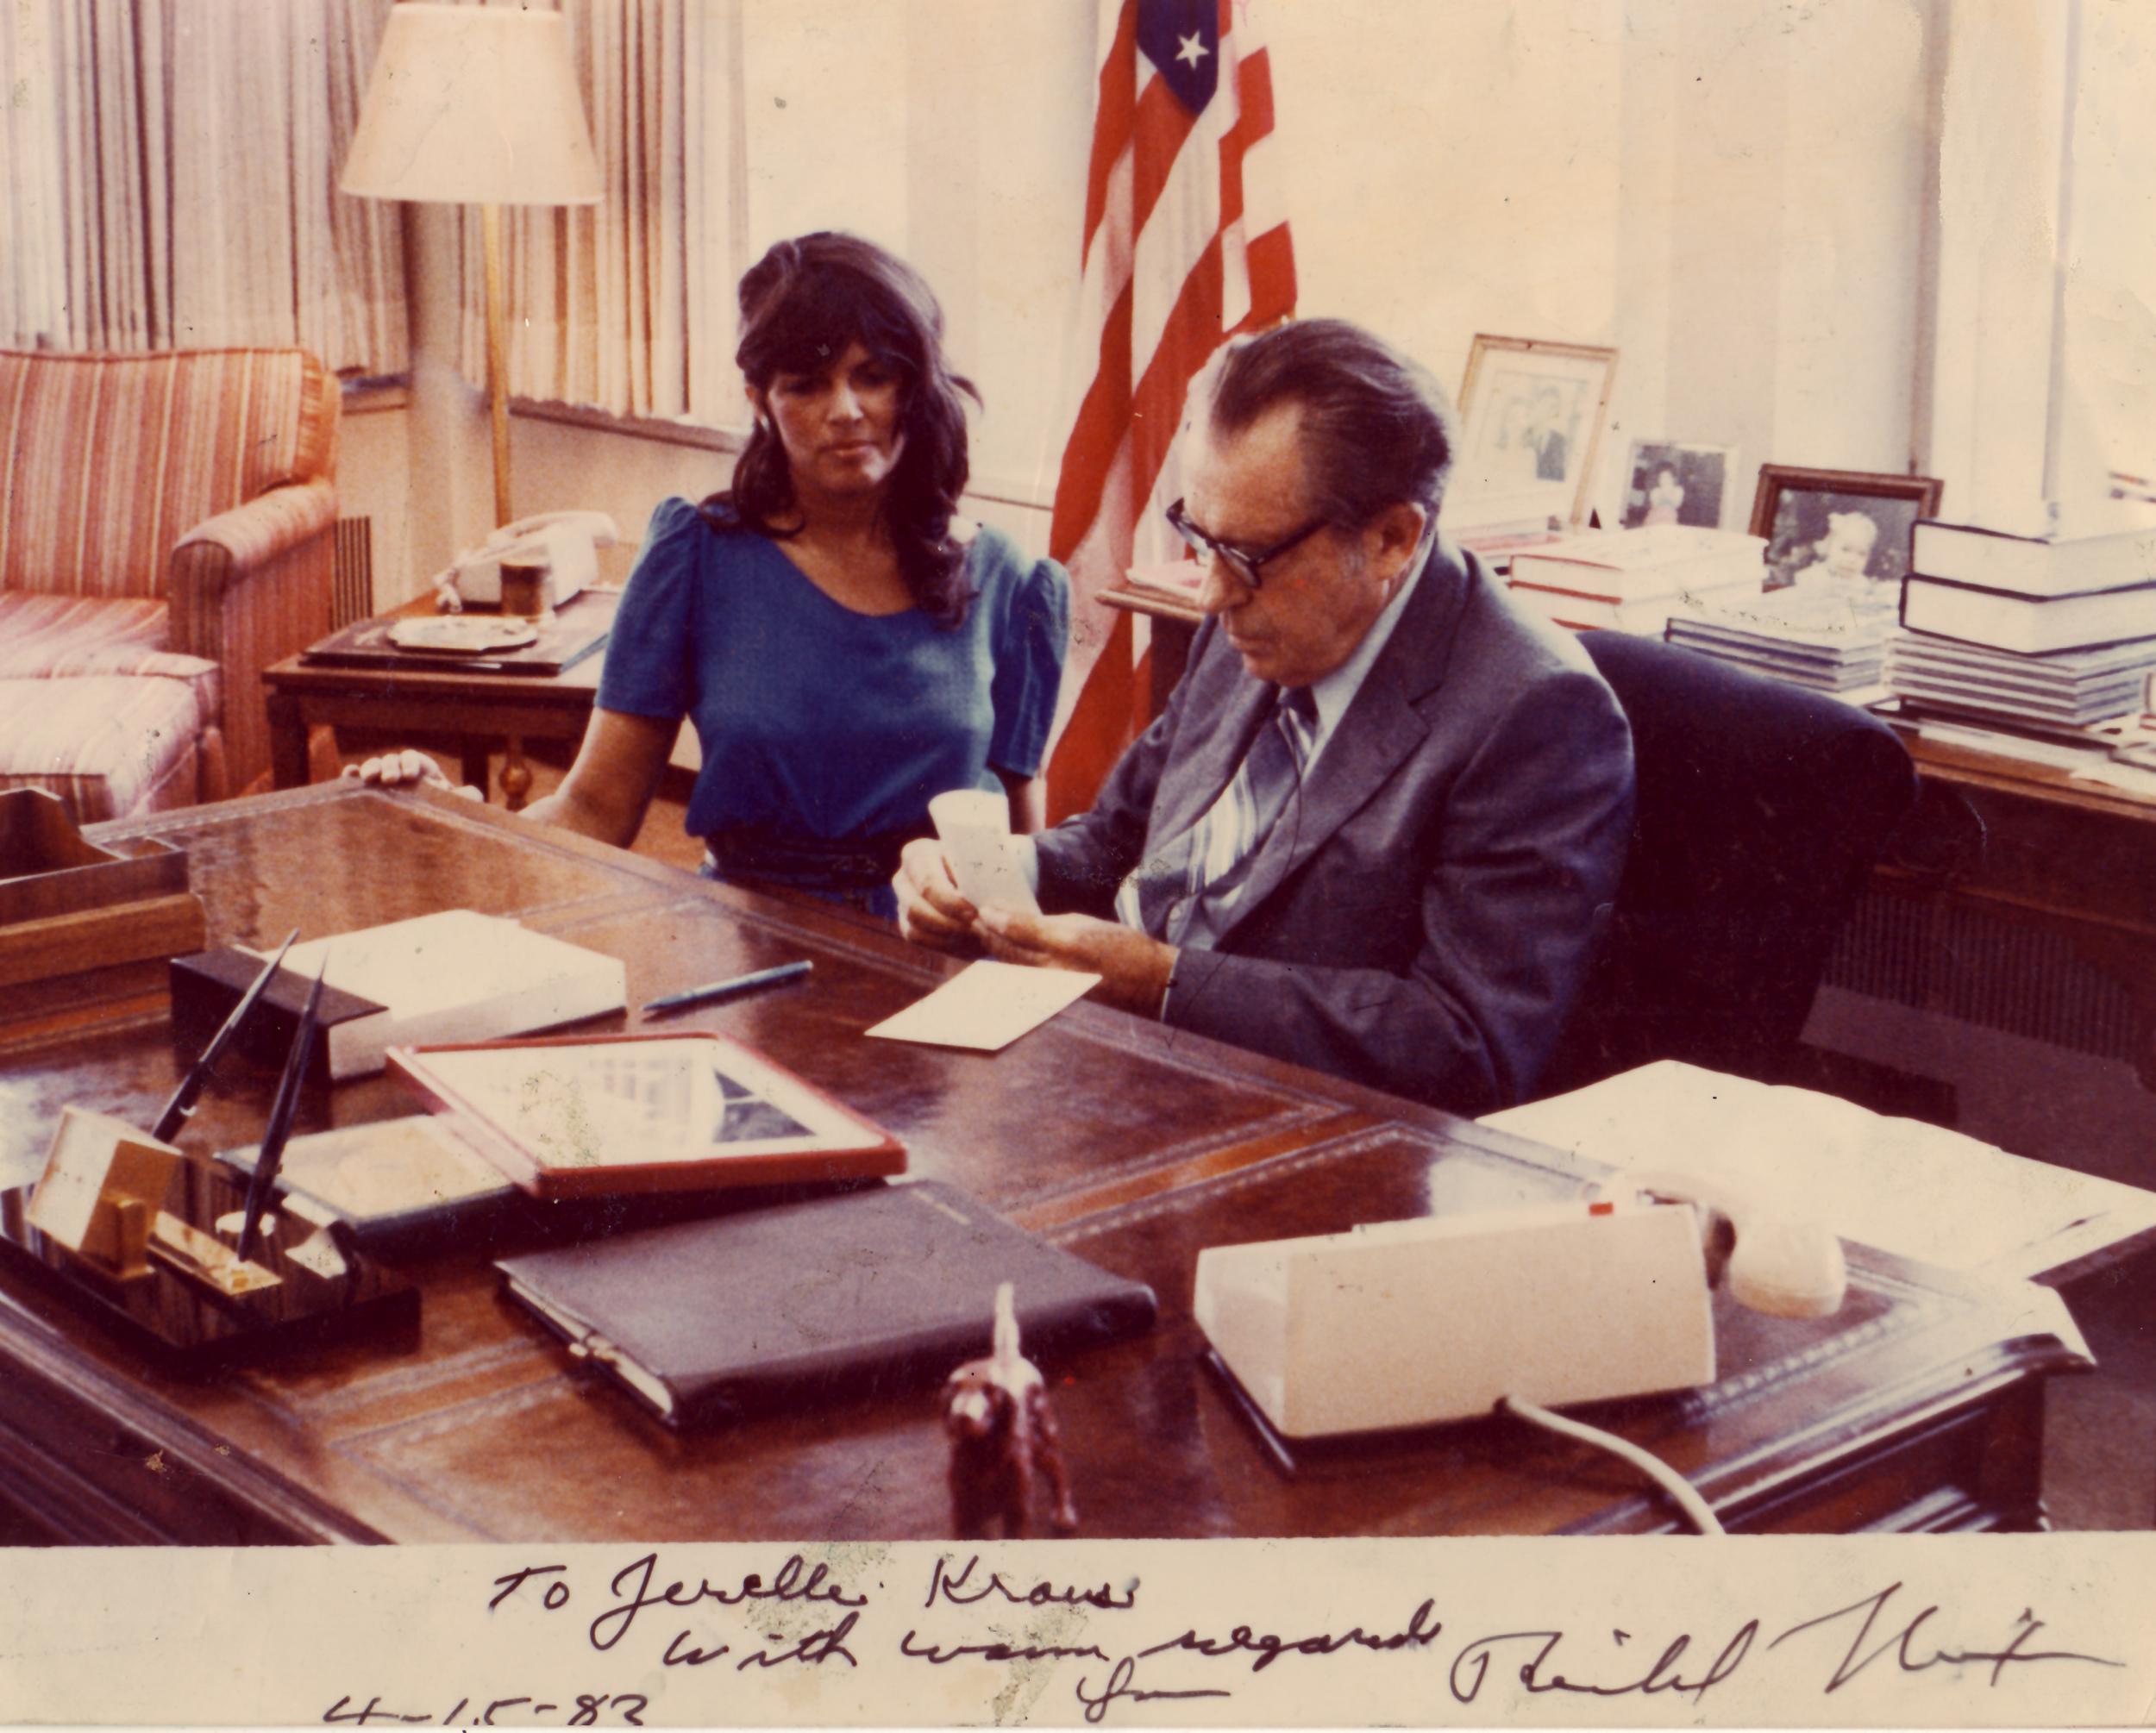 Richard Nixon, President